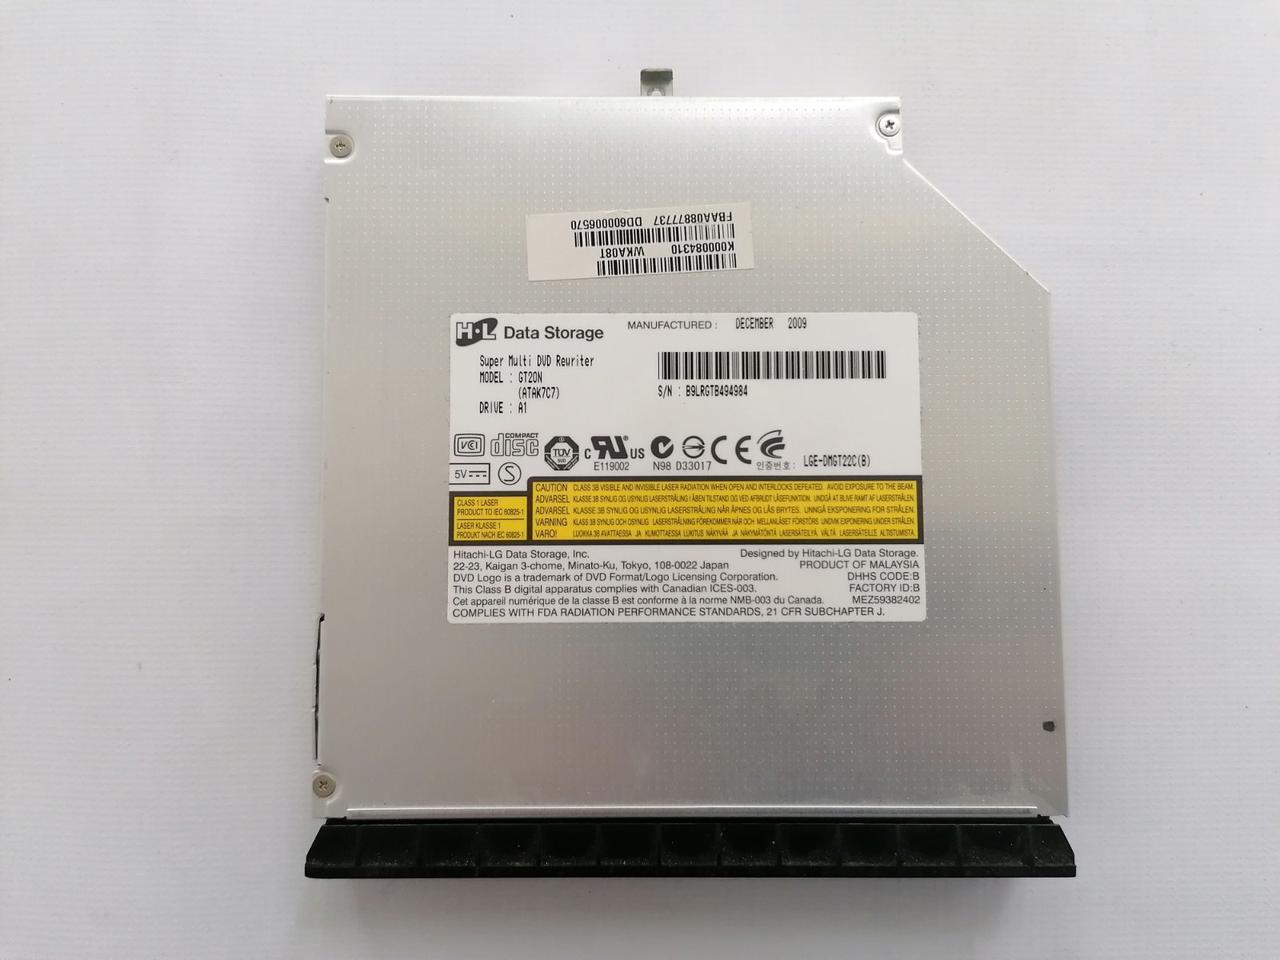 Б/У Оптический привод DVD±RW Hitachi LG GT20N от Toshiba Satellite L500